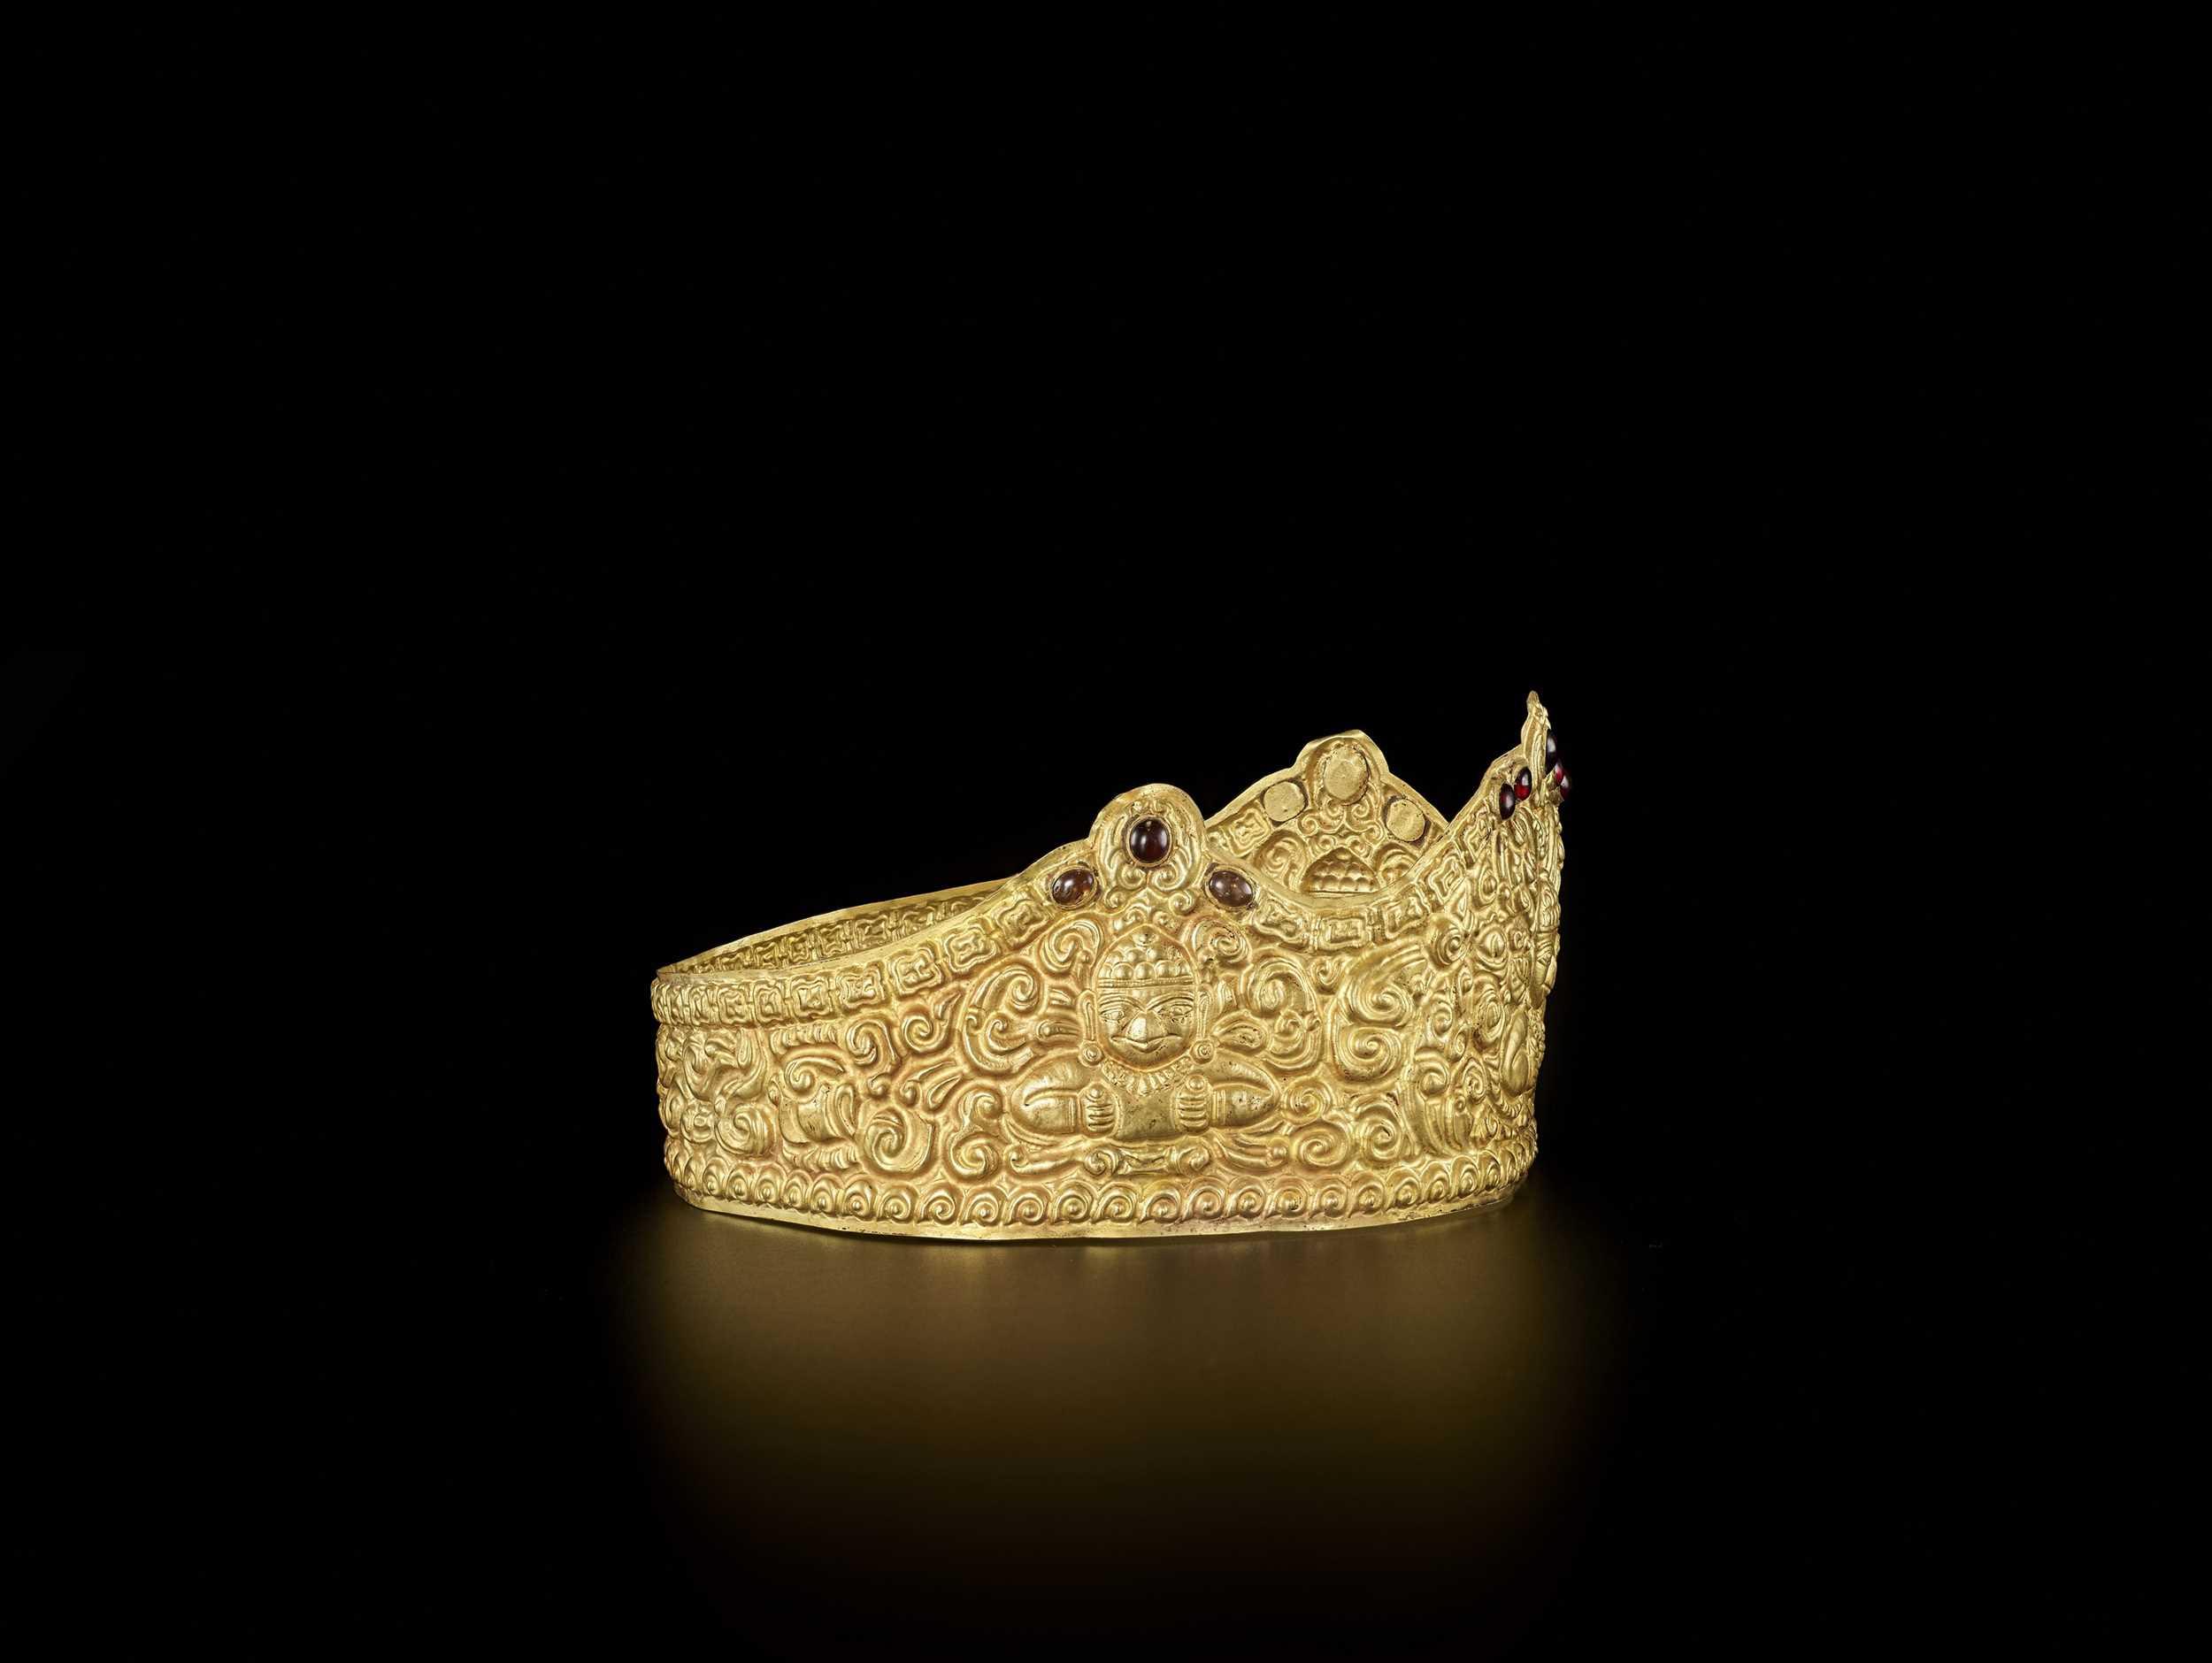 AN EXTRE MELY RARE AND FINE CHAM GEMSTONE-SET GOLD REPOUSSÉ CROWN WITH GARUDAS - Bild 8 aus 9